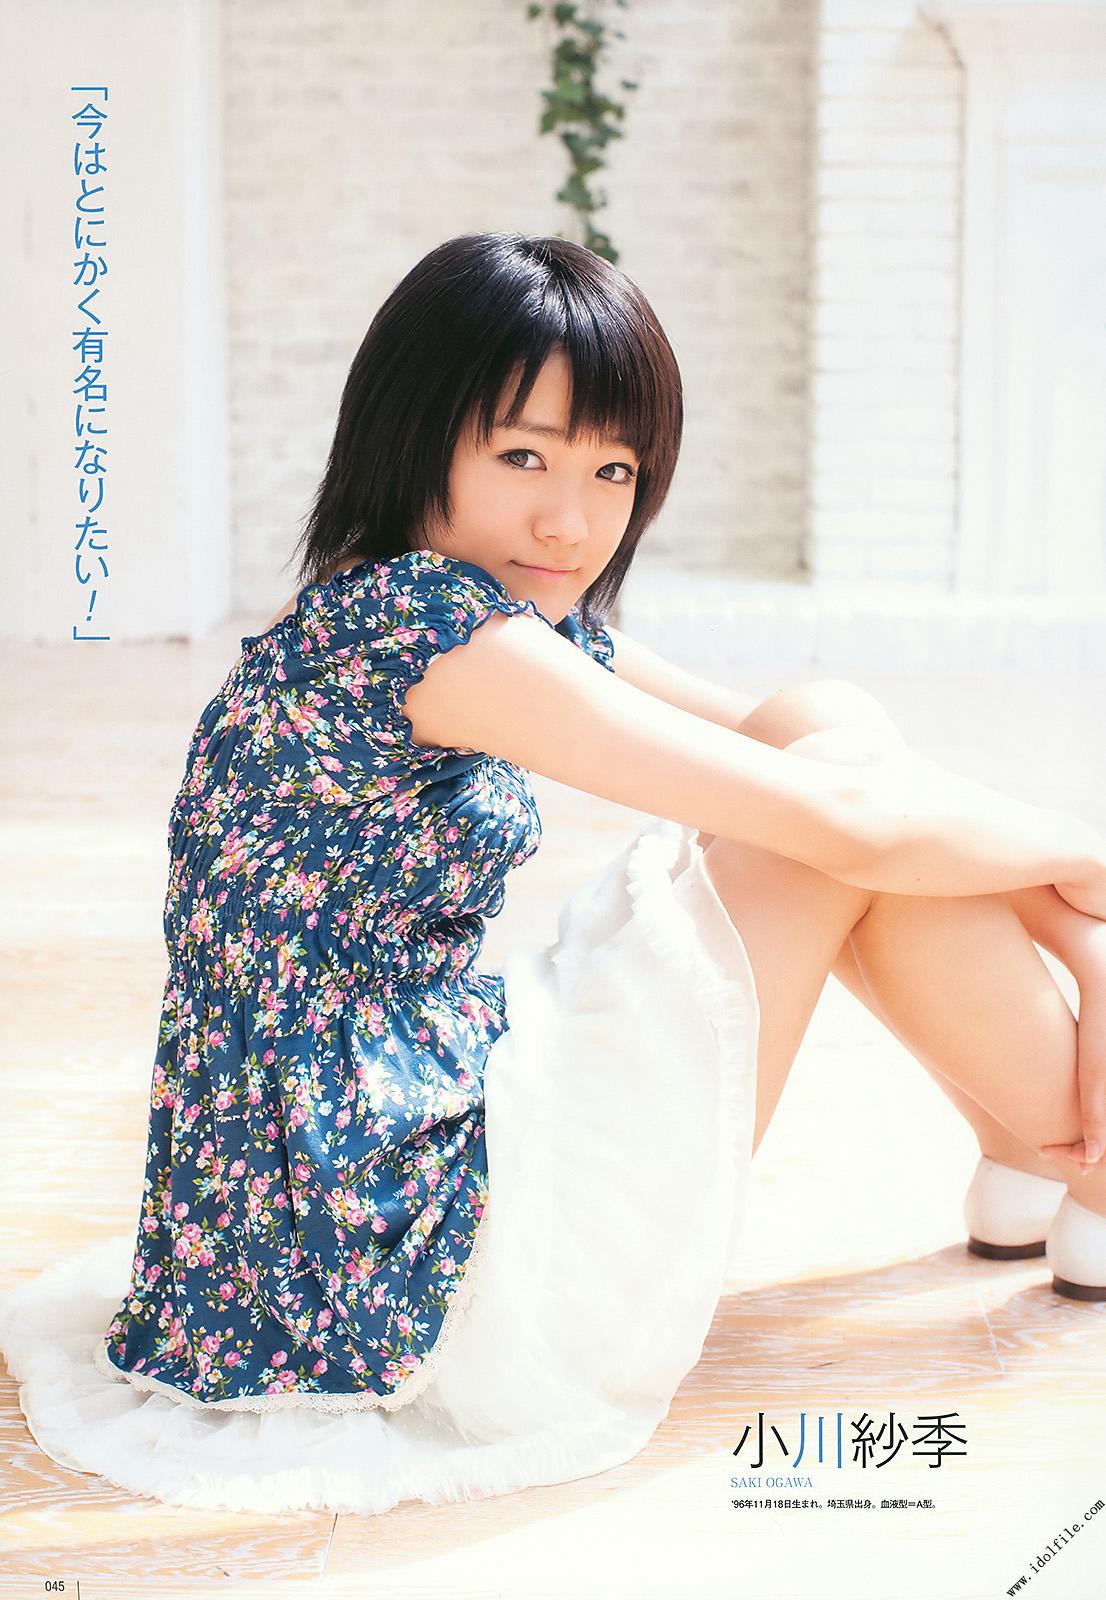 File:Sakijune.jpg